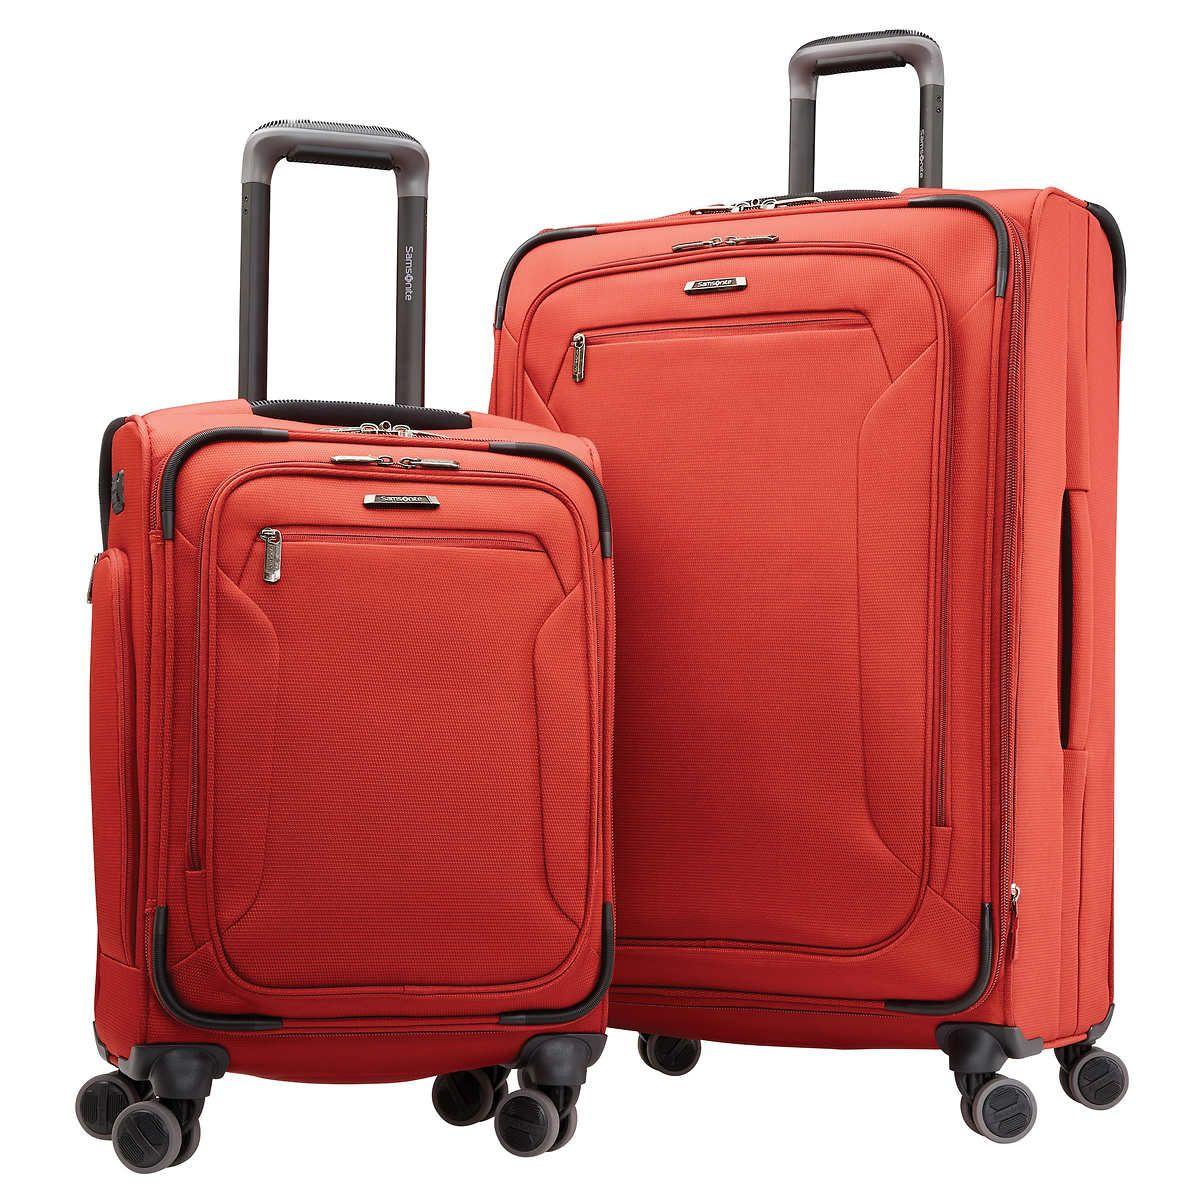 Samsonite Explore Eco 2 Piece Softside Suitcase Set in Black